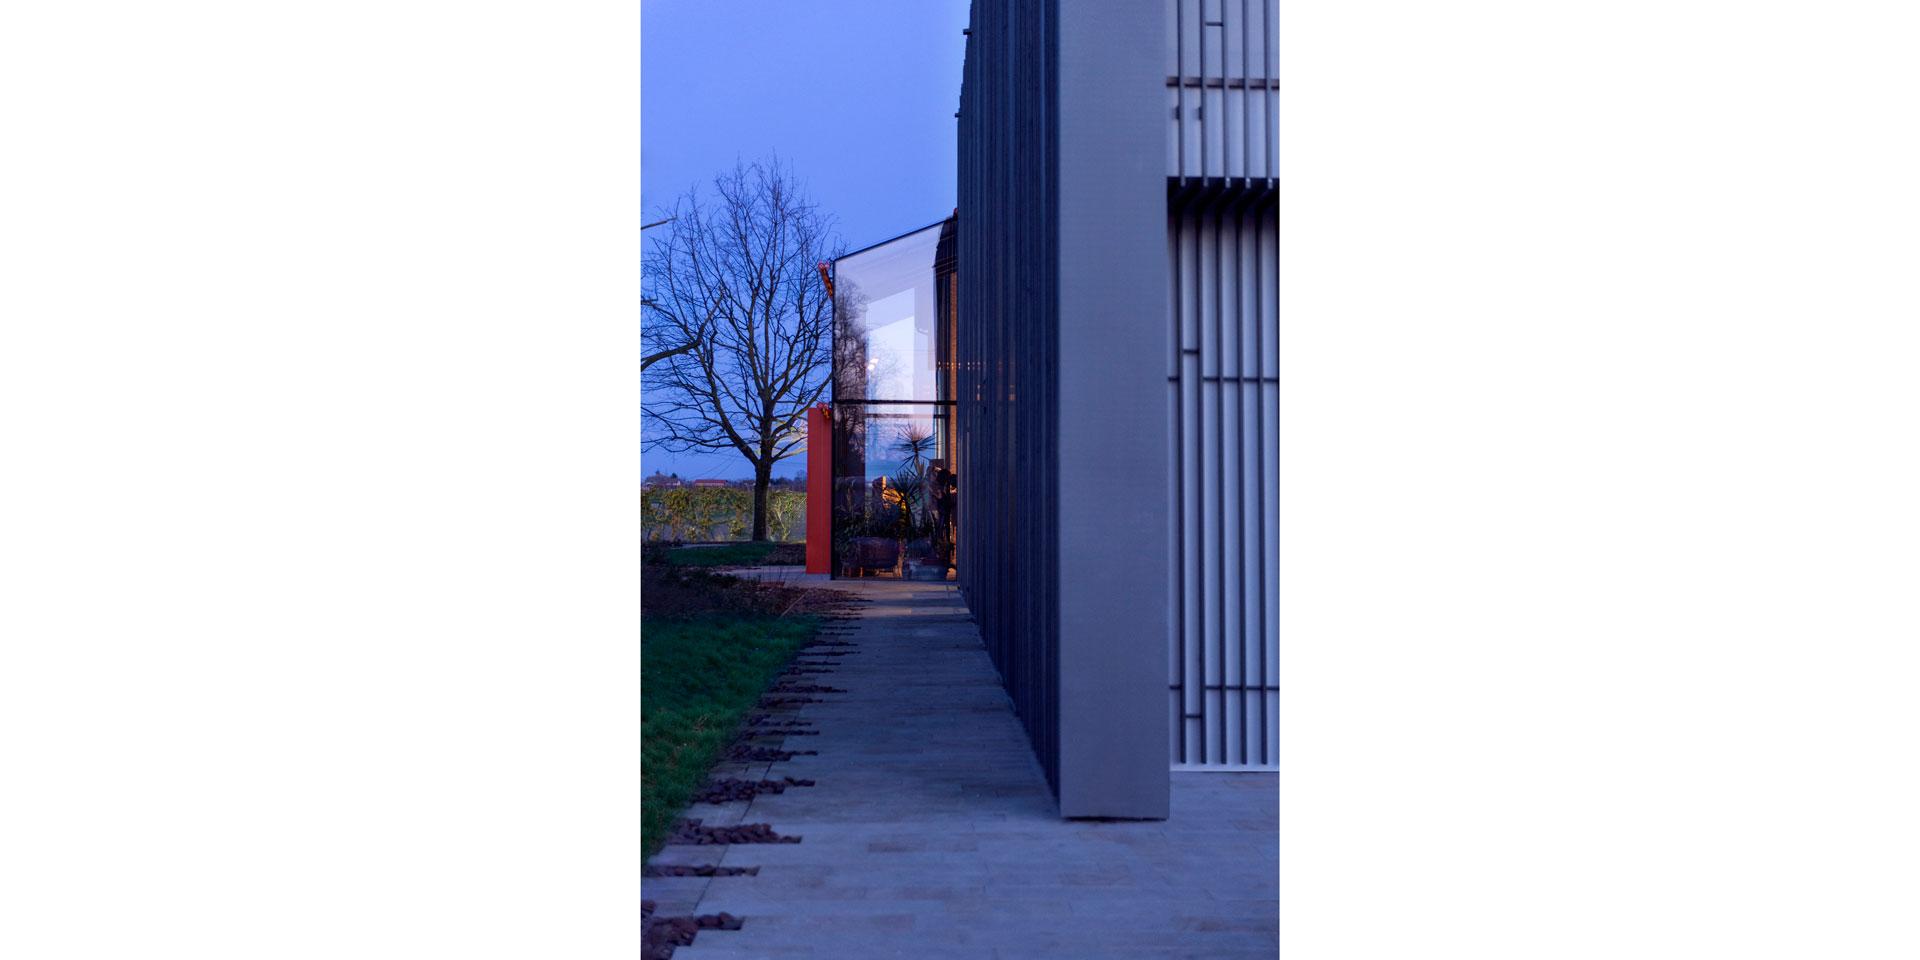 archinow_PRA_residenza-privata-prada_F09